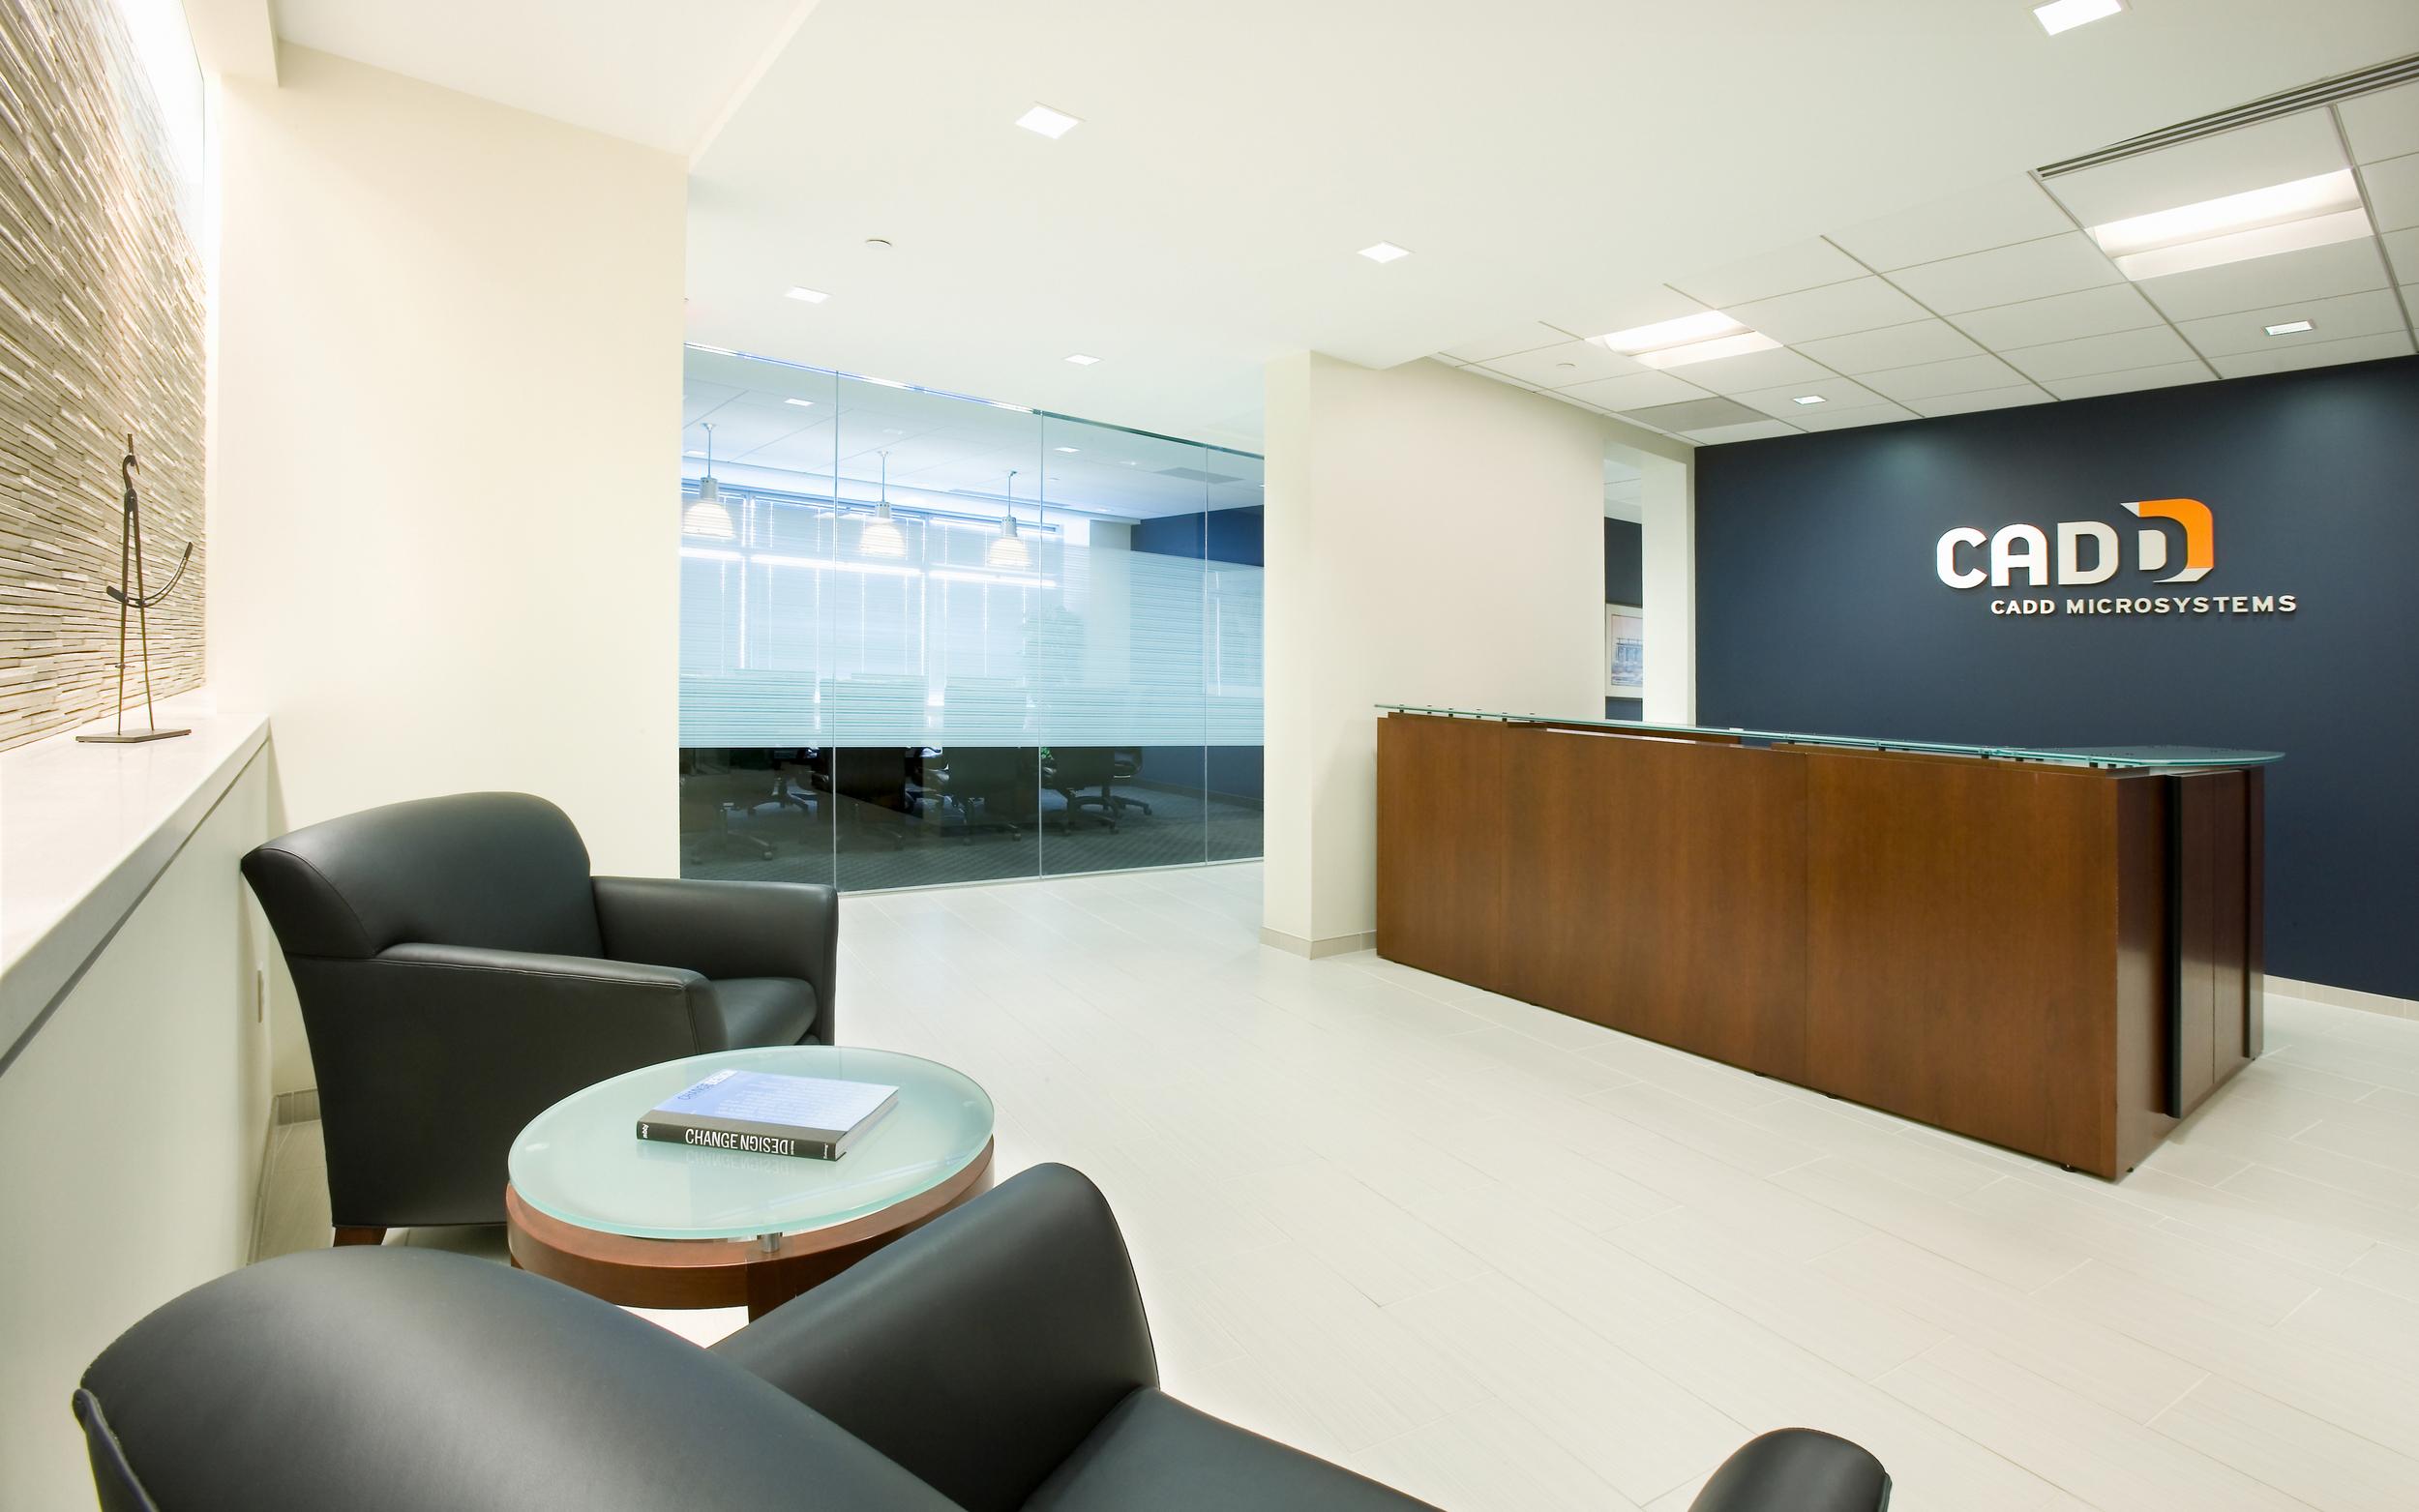 03 CADD Microsystems Lobby.jpg